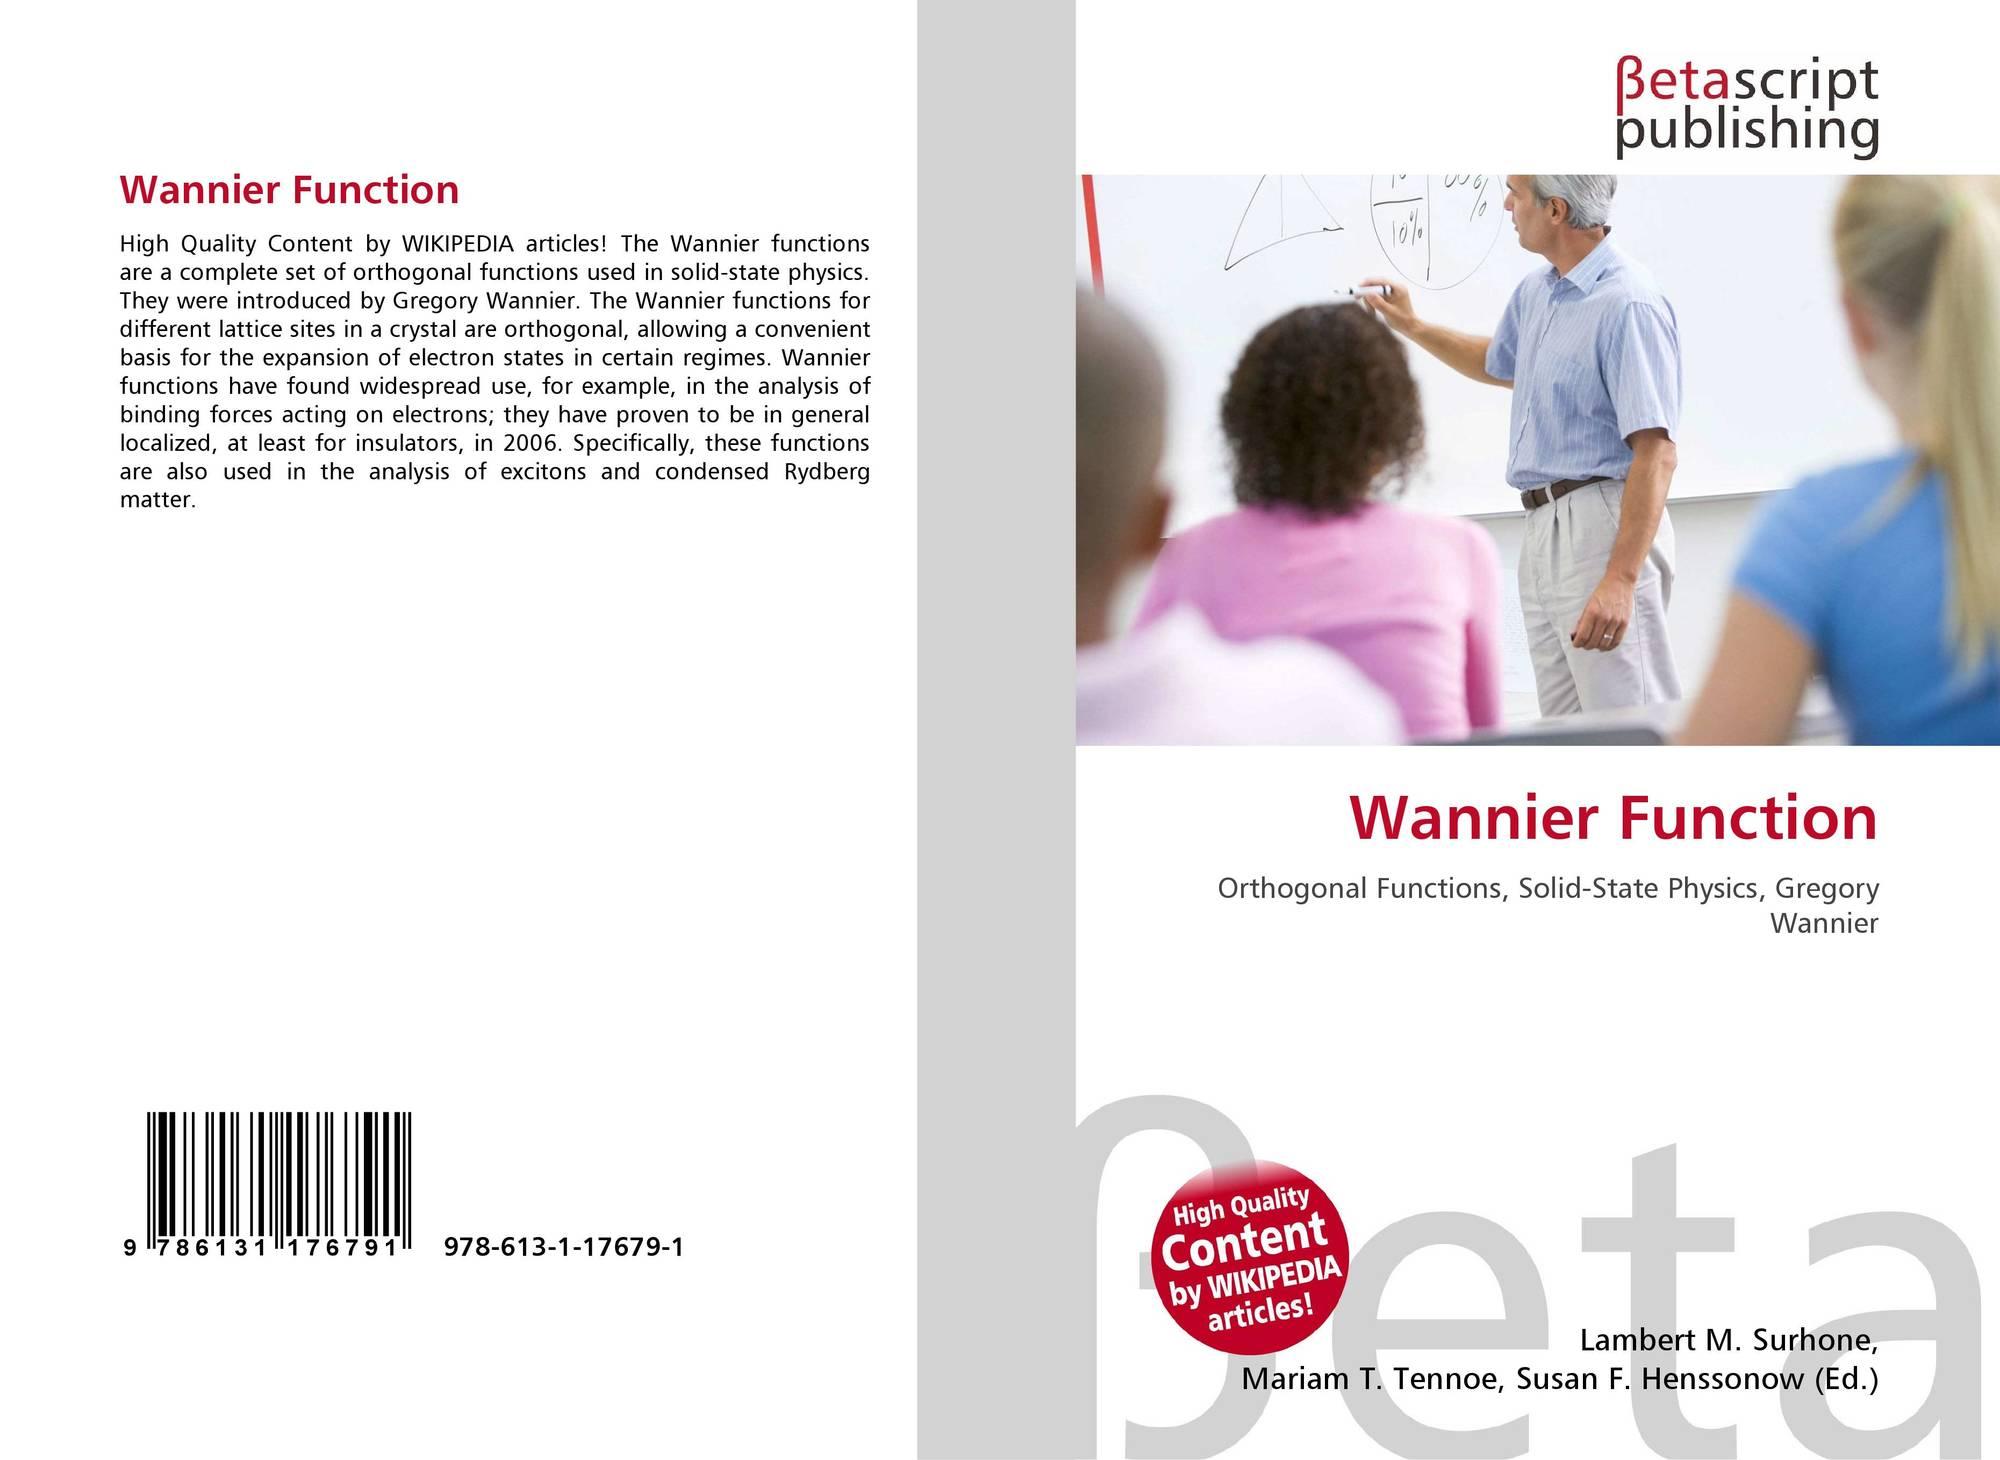 Wannier Function, 978-613-1-17679-1, 6131176795 ,9786131176791